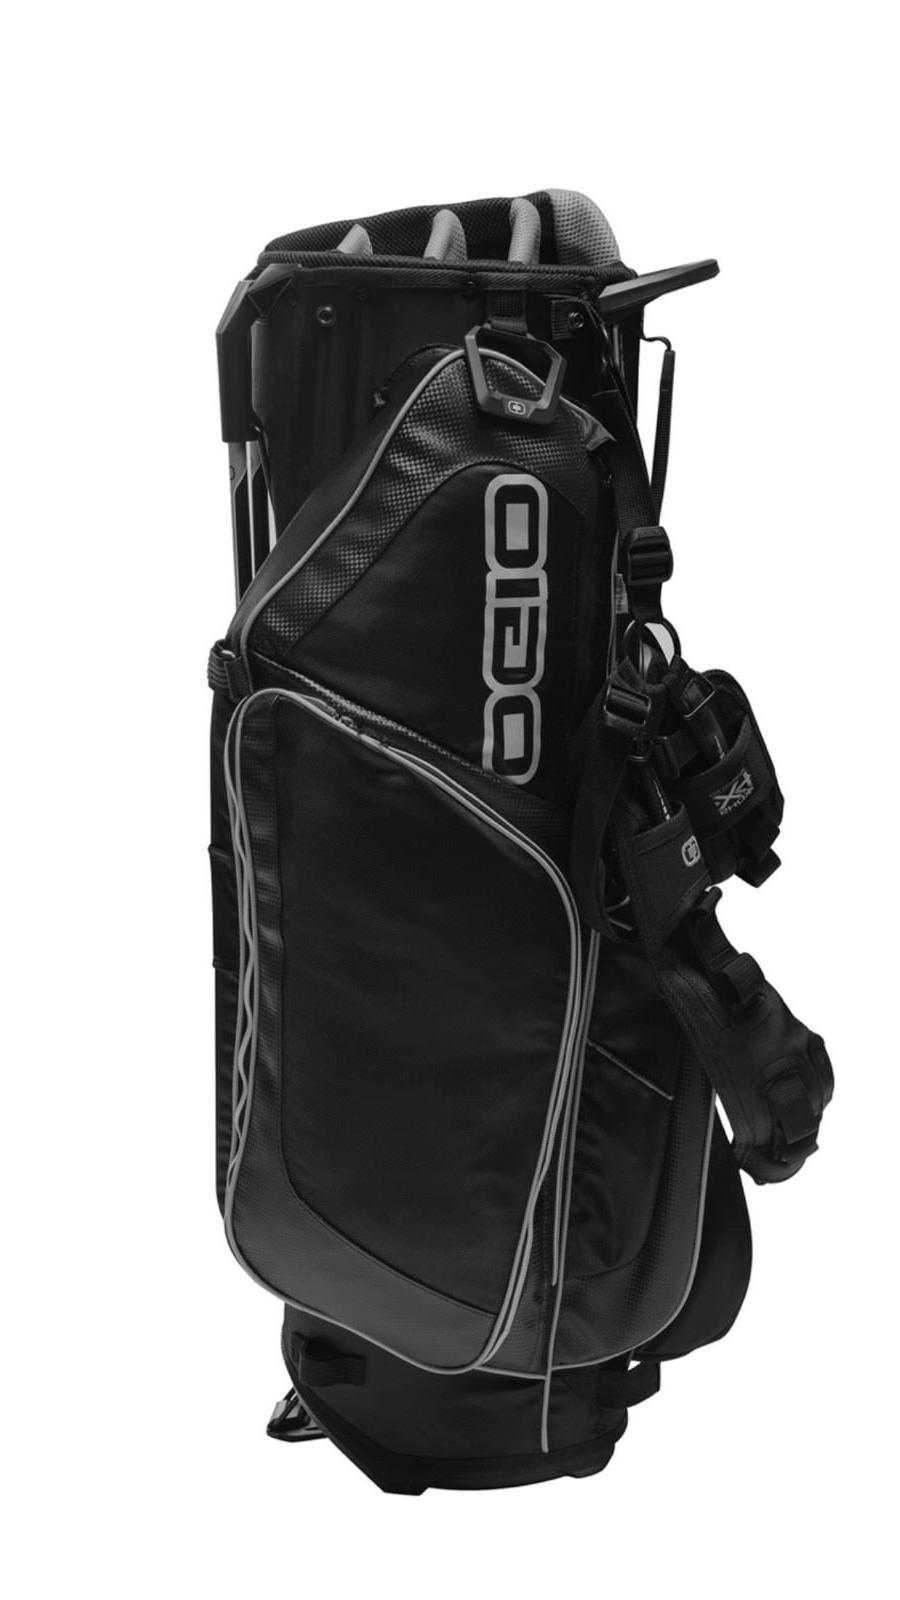 2018 orbit standing golf bag black